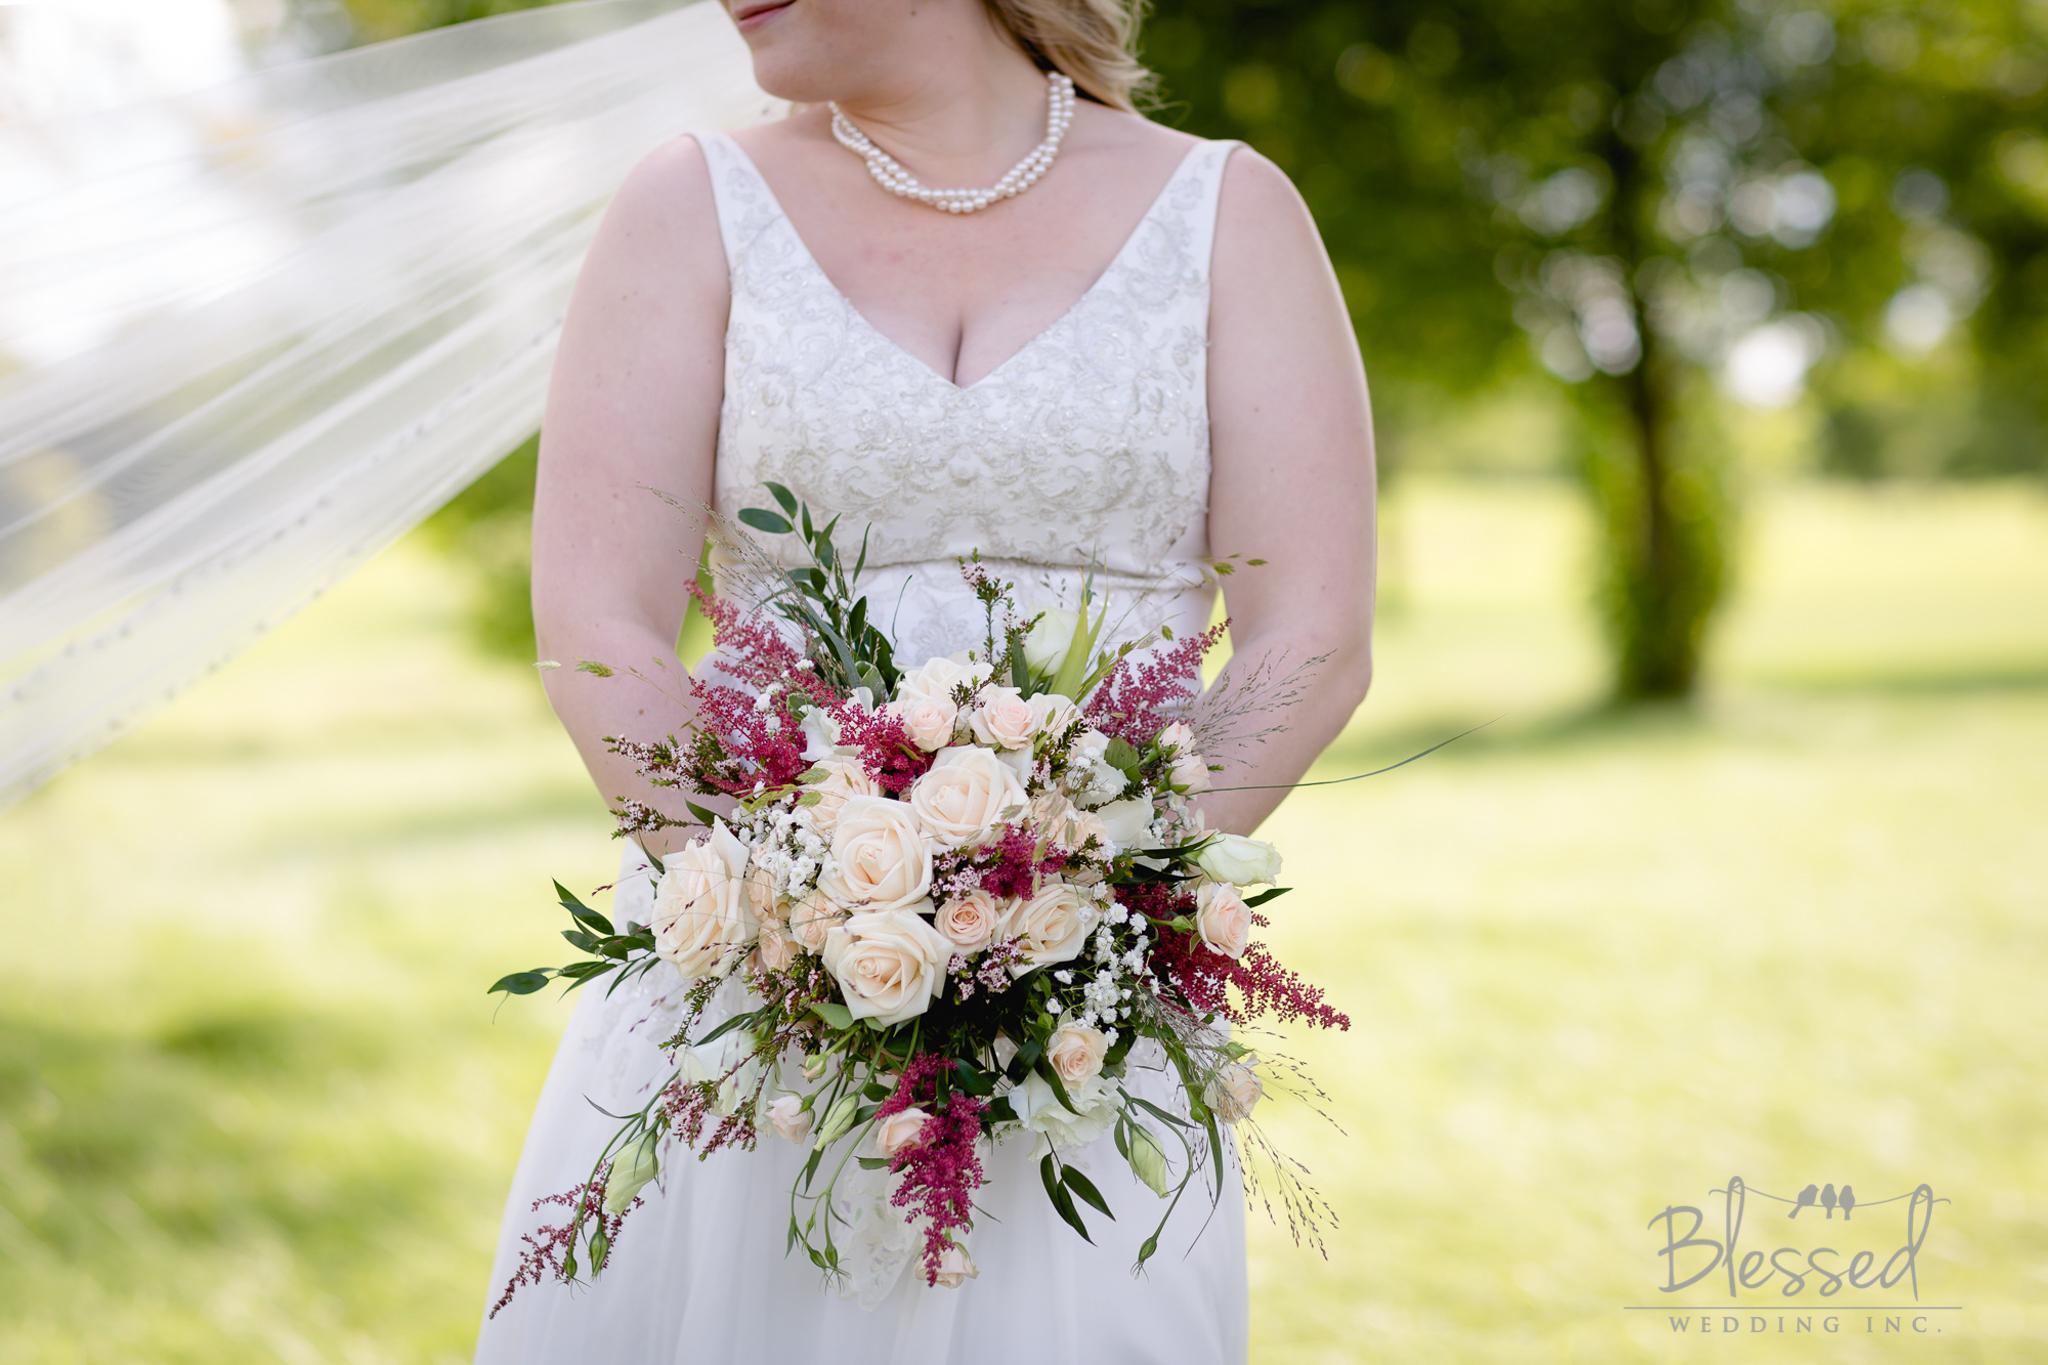 Destination Wedding Photography Minnesota By Blessed Wedding Photographers-43.jpg